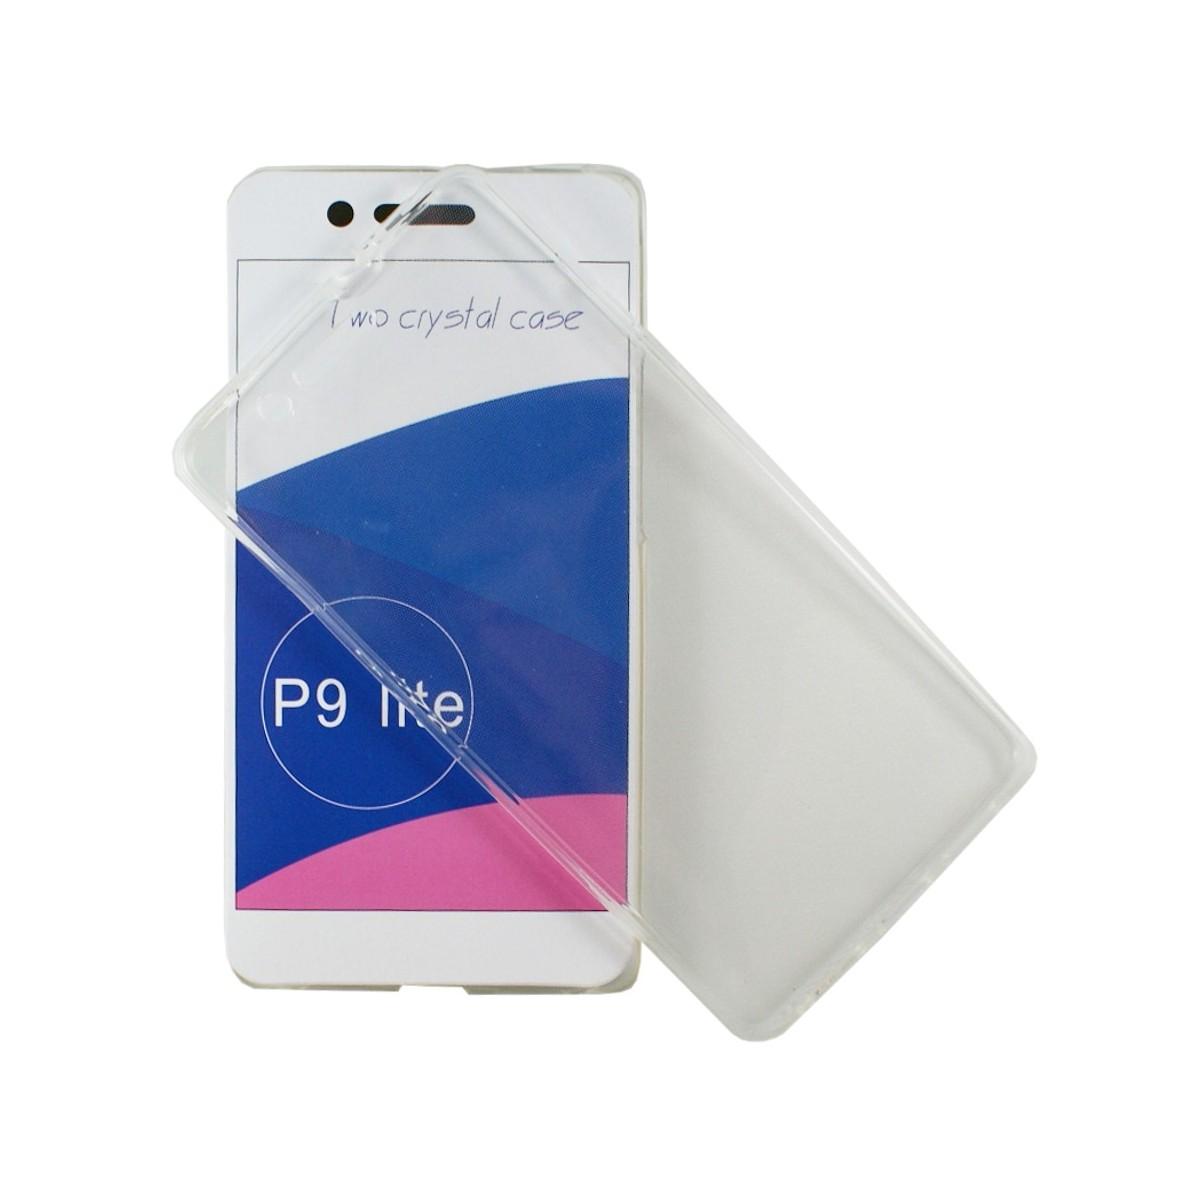 Coque Huawei P9 Lite protection 360 ° Transparente souple - Crazy Kase